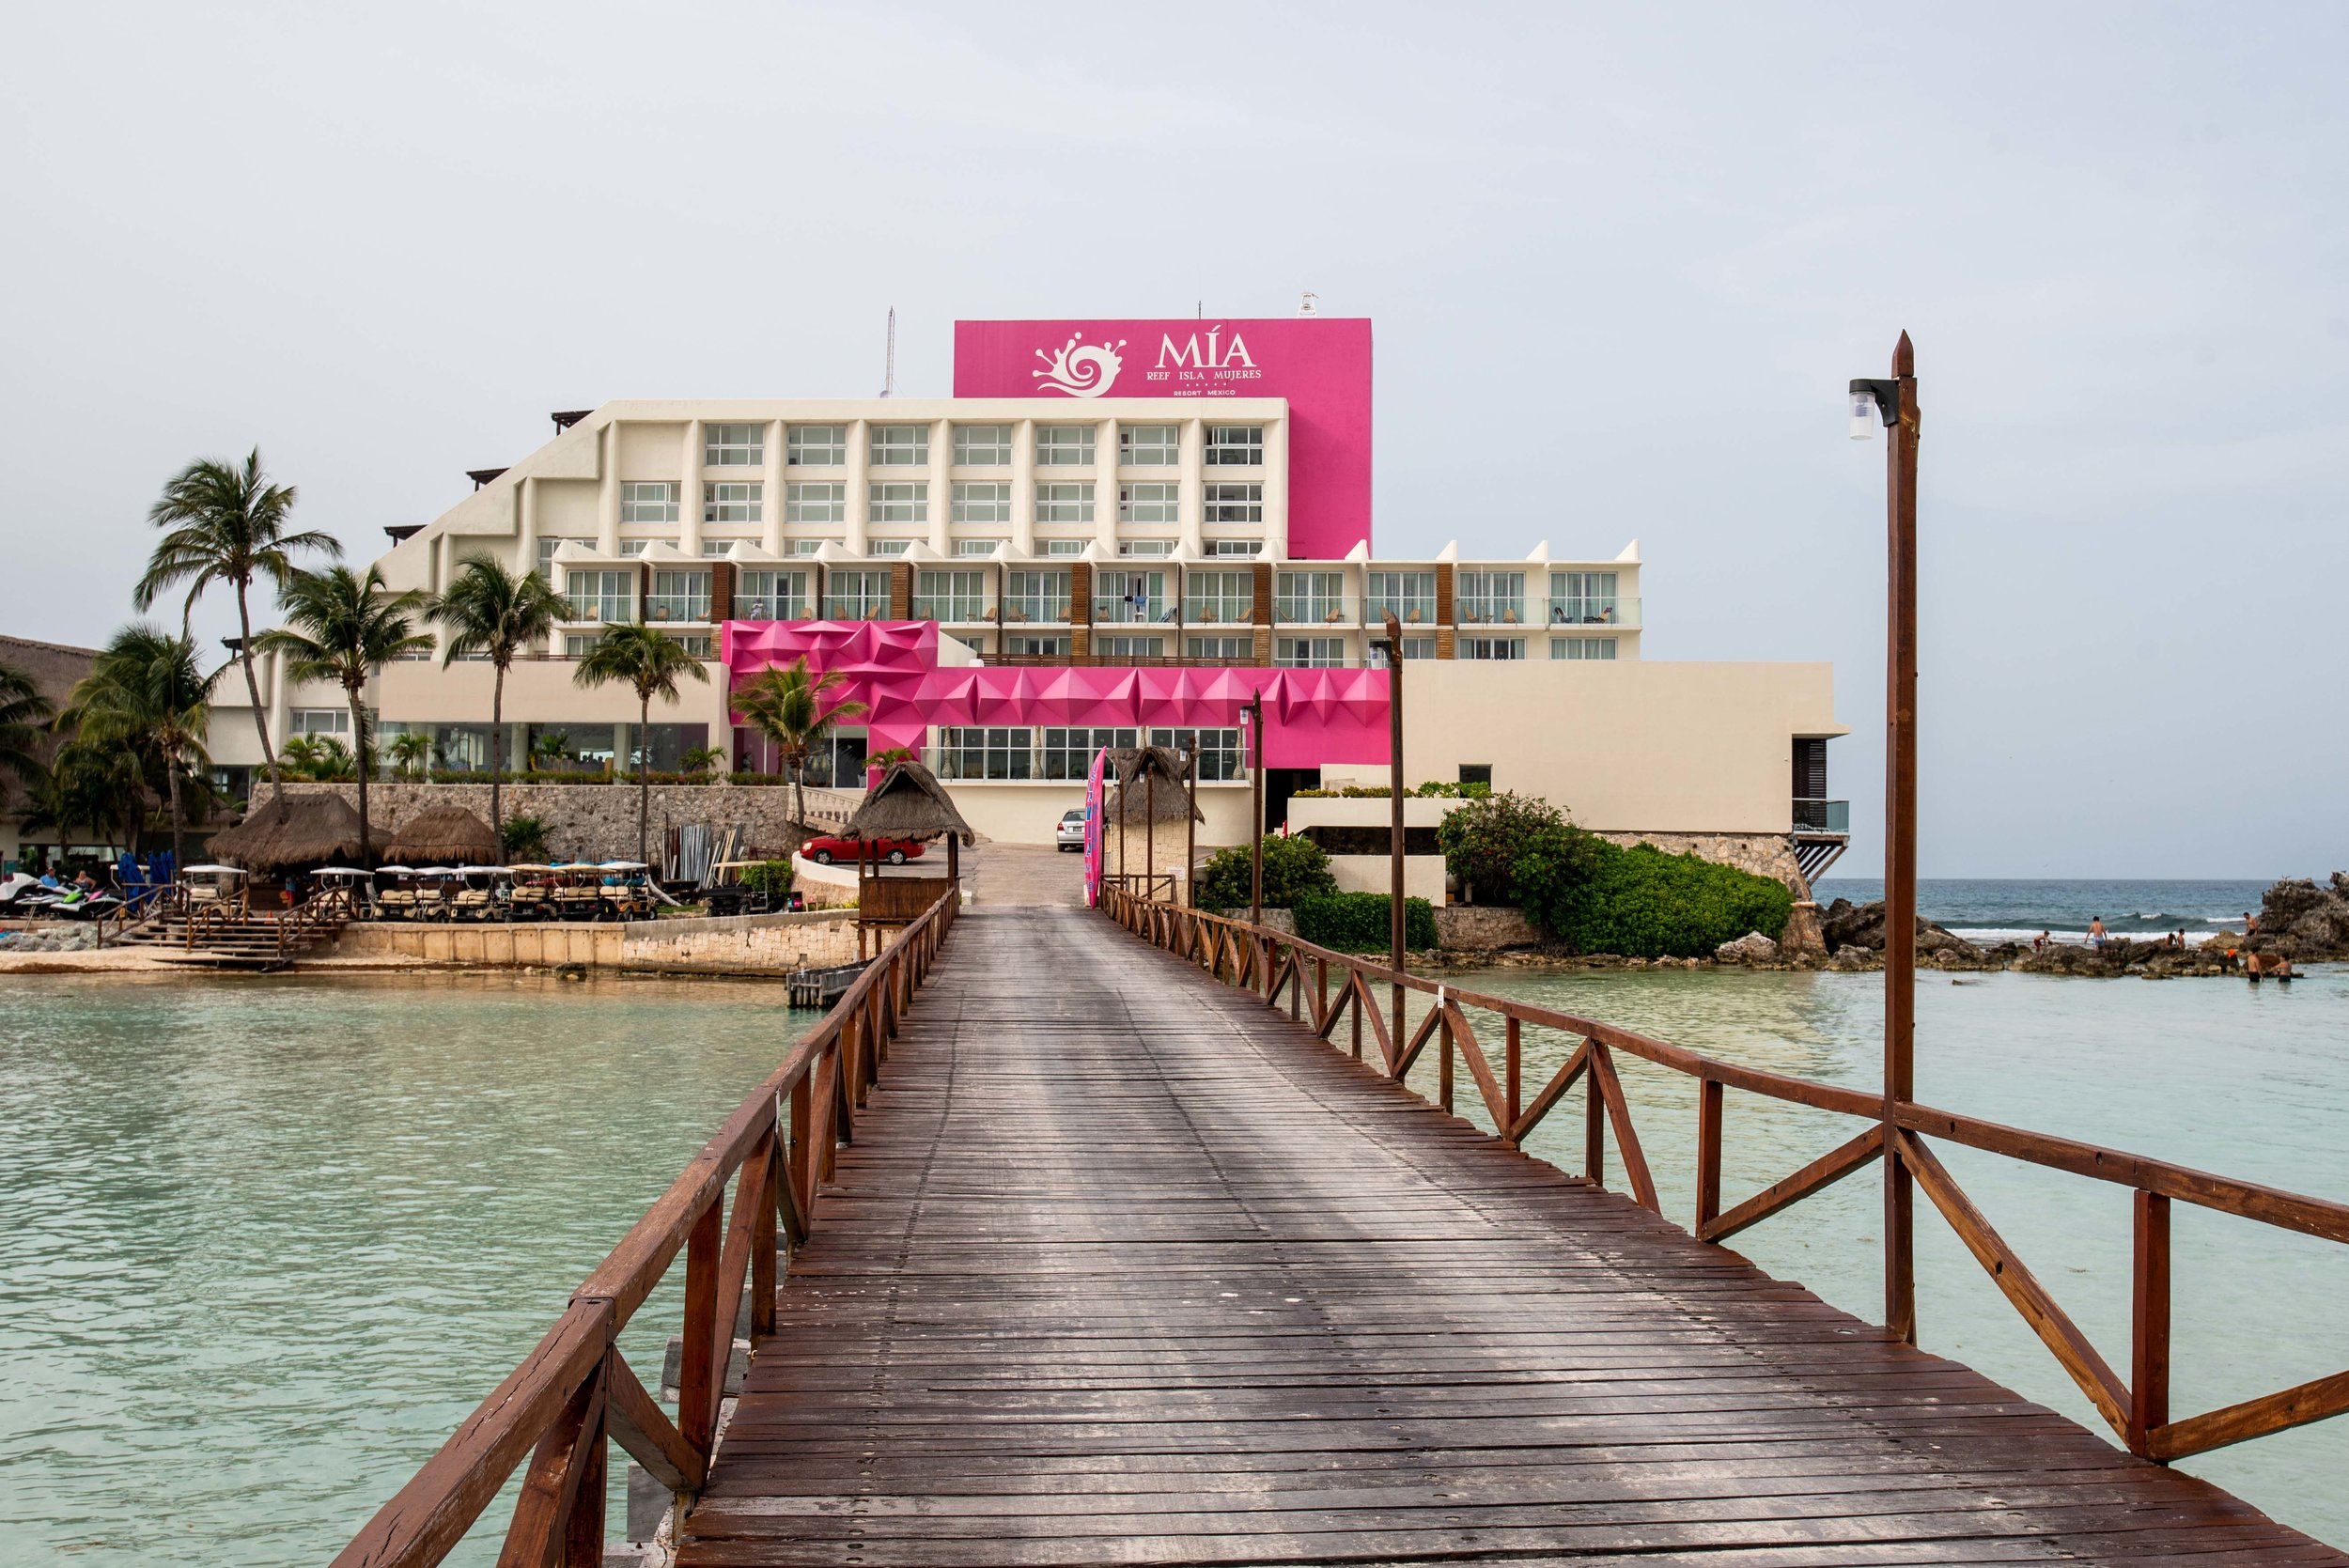 The Mia Reef all-inclusive in Isla Mujeres, Mexico.